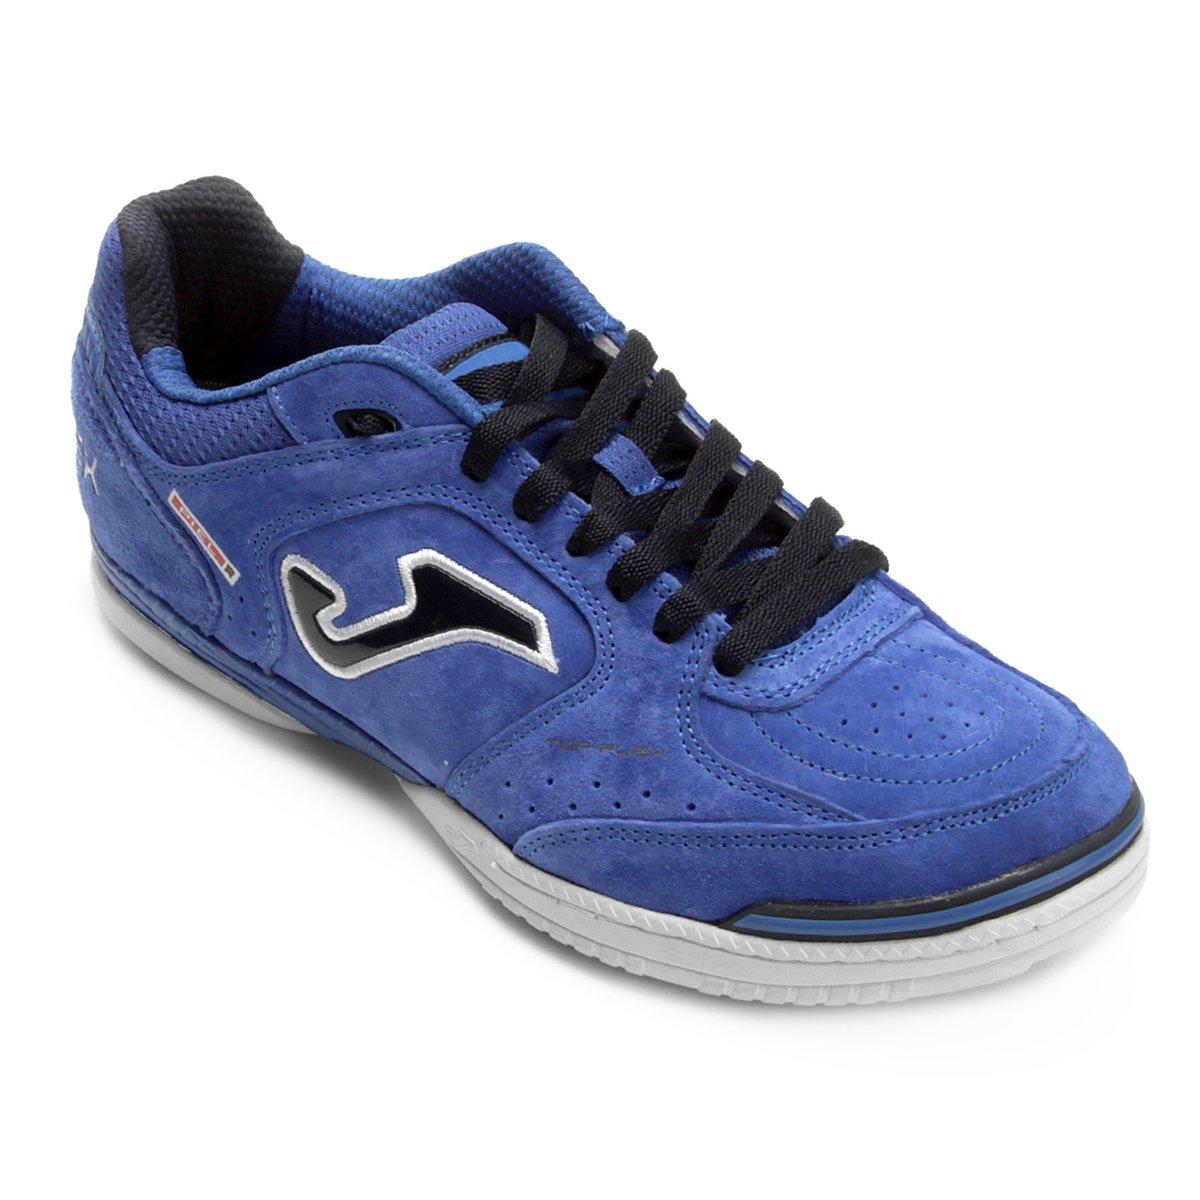 05b75a9ceb Chuteira Futsal Joma Top Flex Nobuck 835 IN - Azul